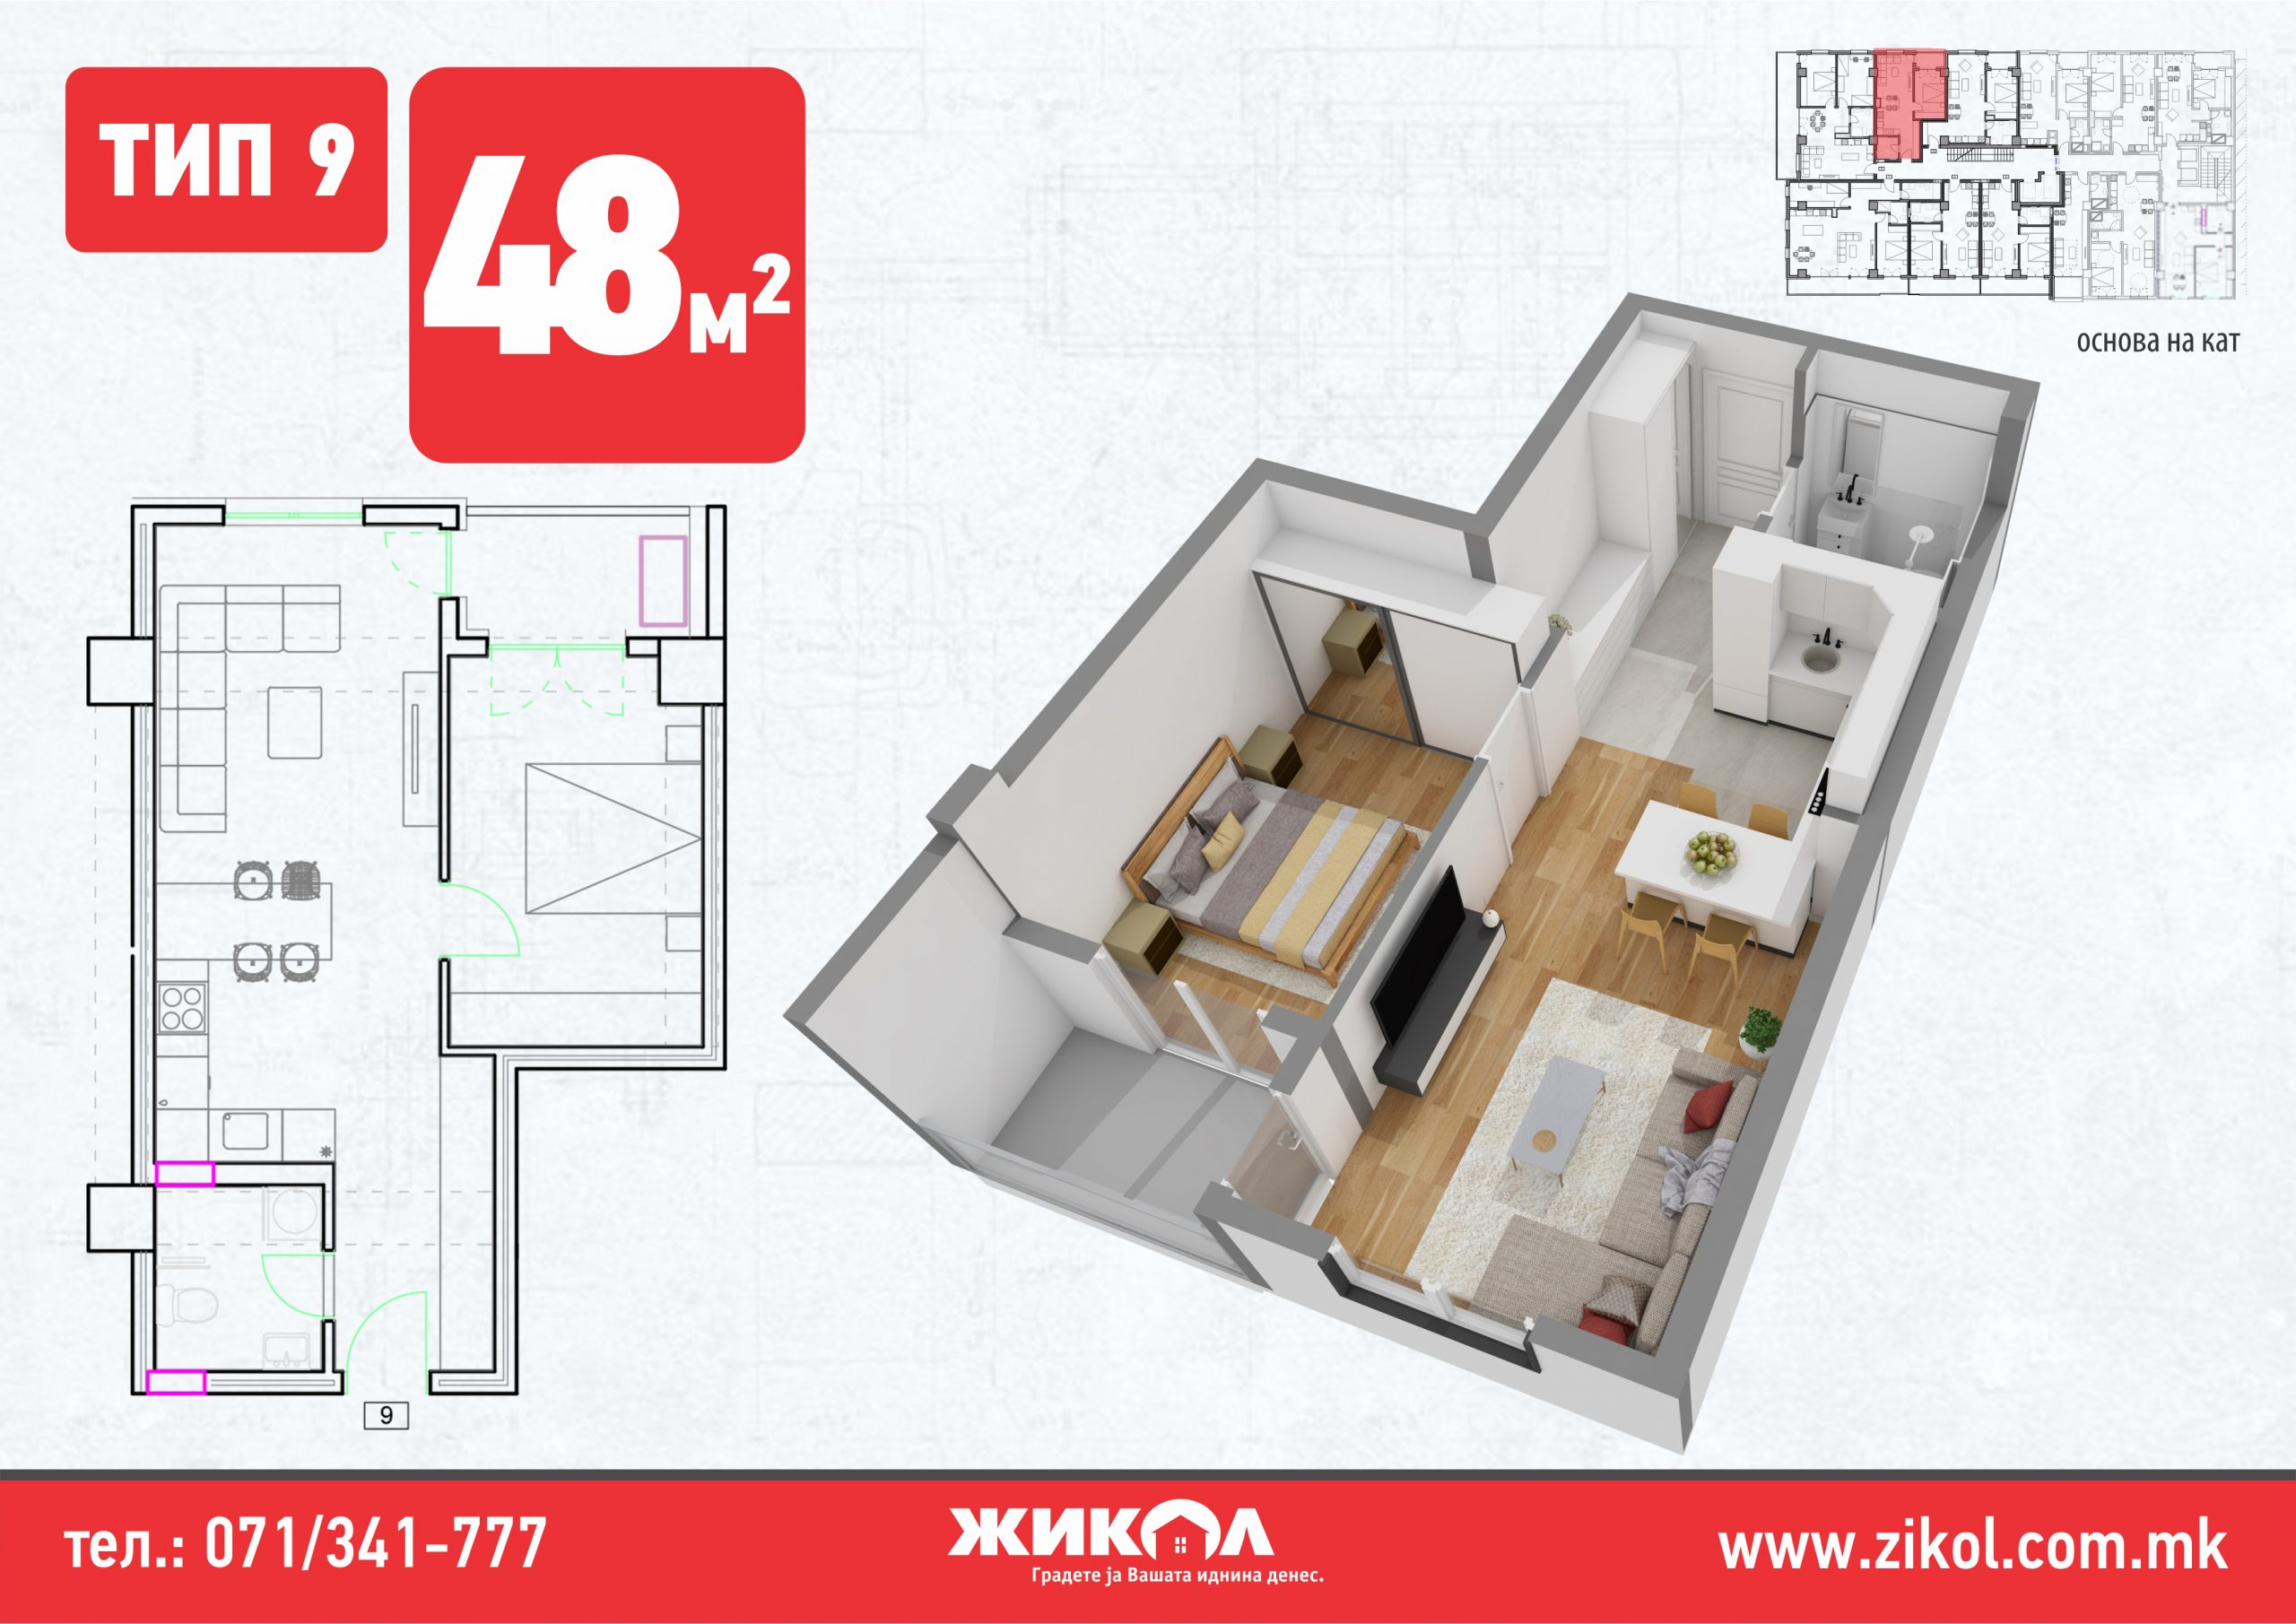 Зграда 55, кат 2, стан 19